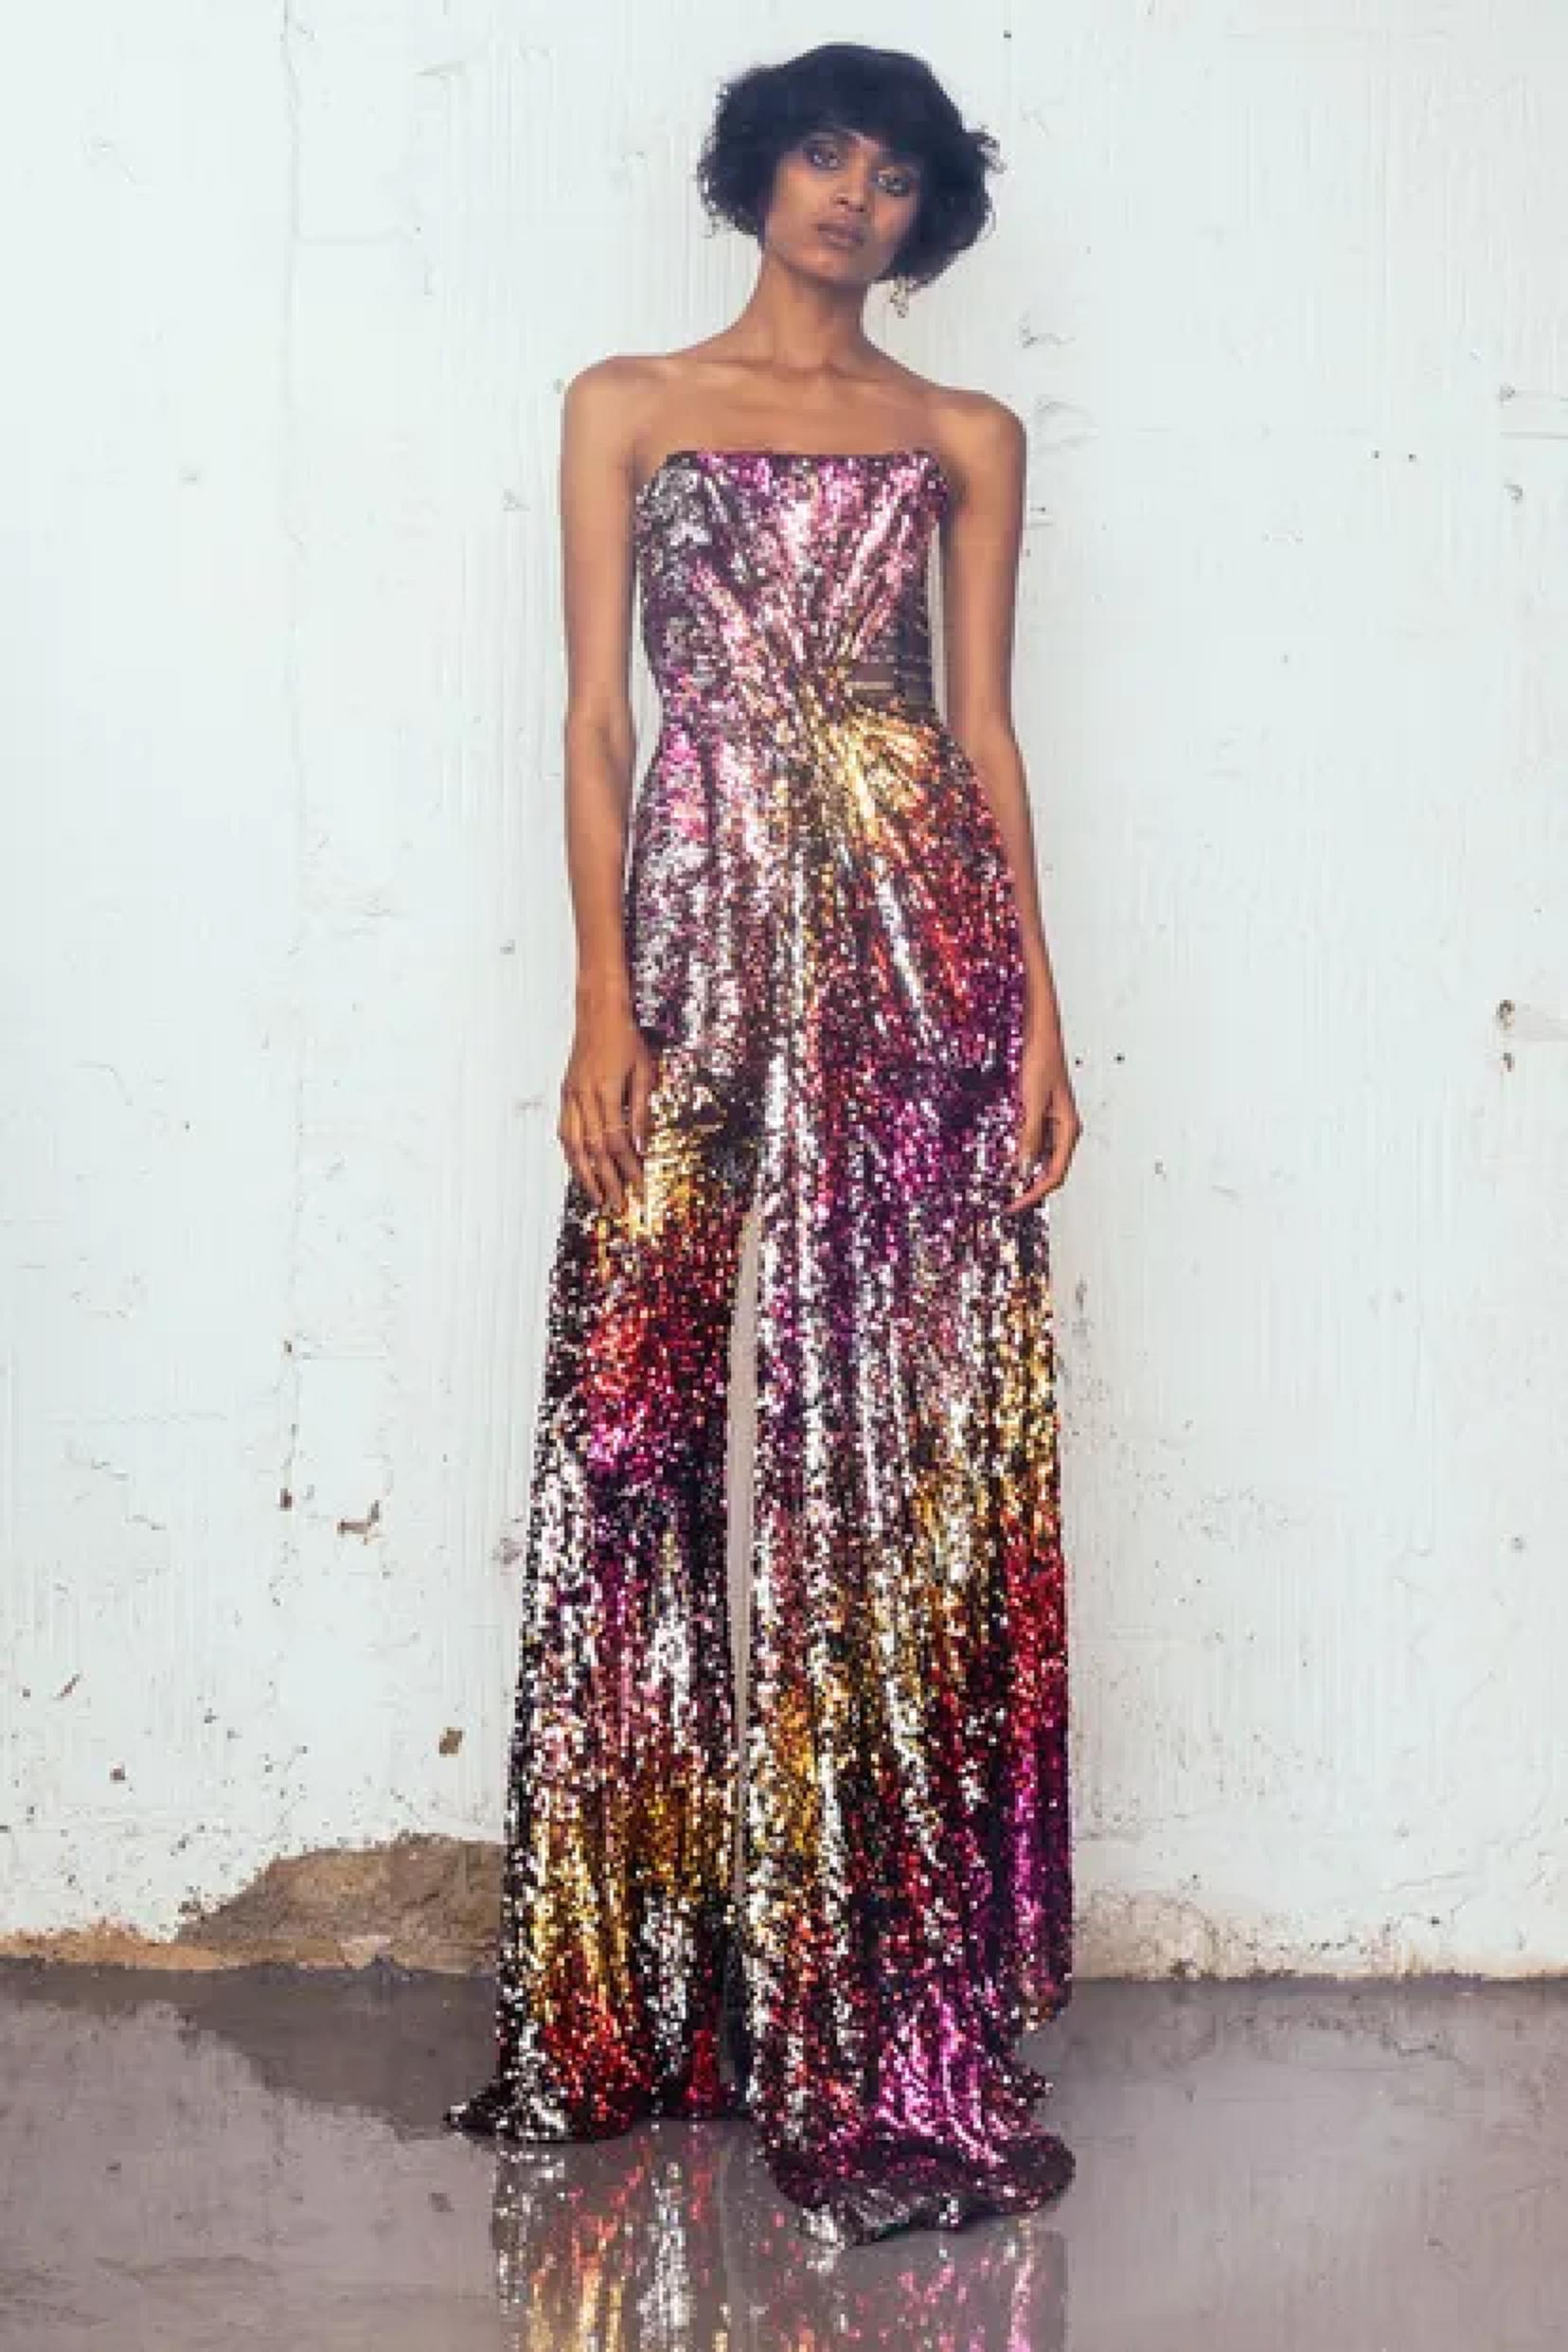 Best bling dresses online 2021 All Over Sequined Off The Shoulder Sleeveless Jumpsuit